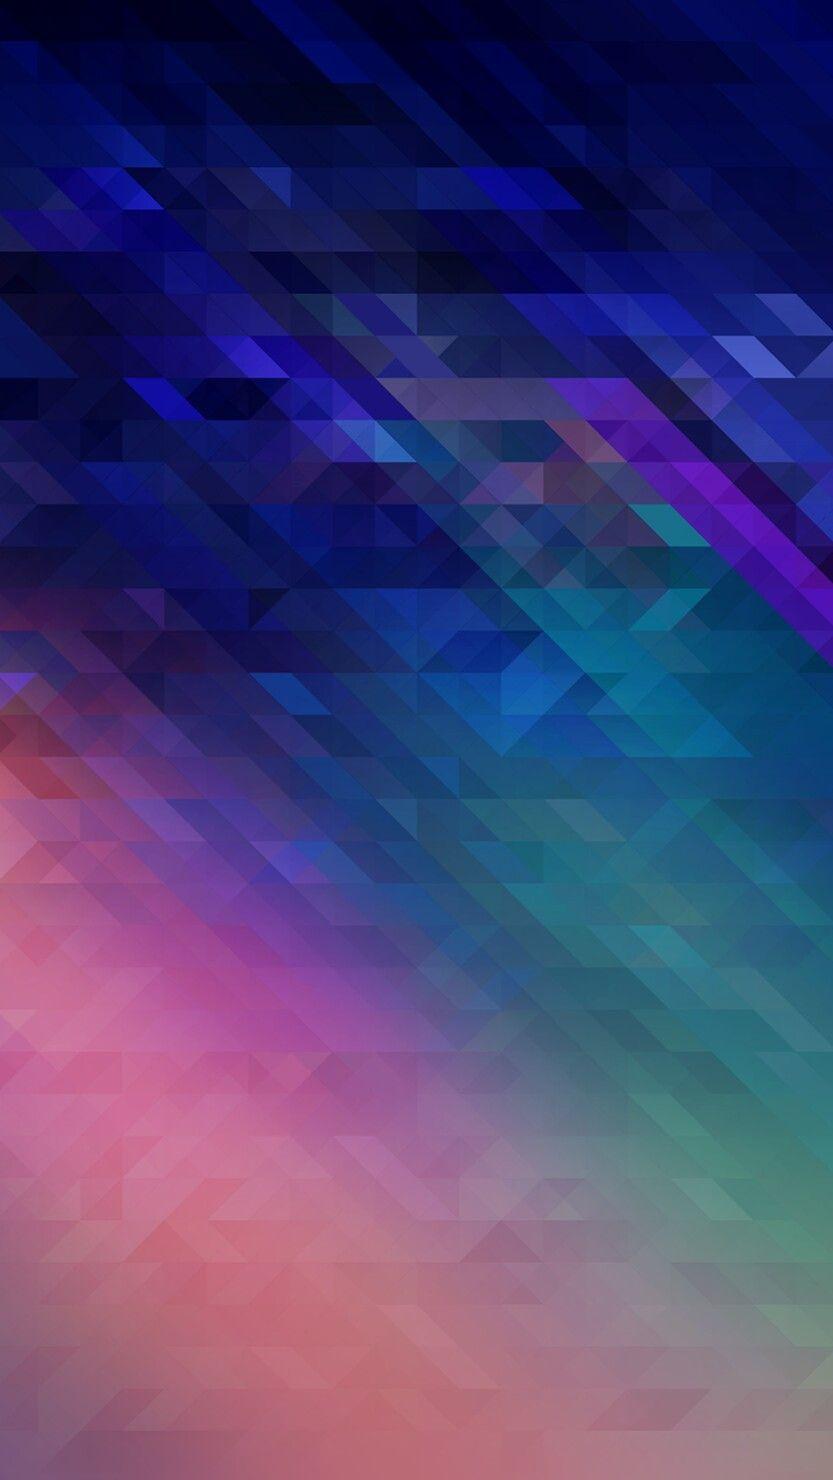 Galaxy a6 Material Minimal Pattern Iphone wallpaper 833x1480